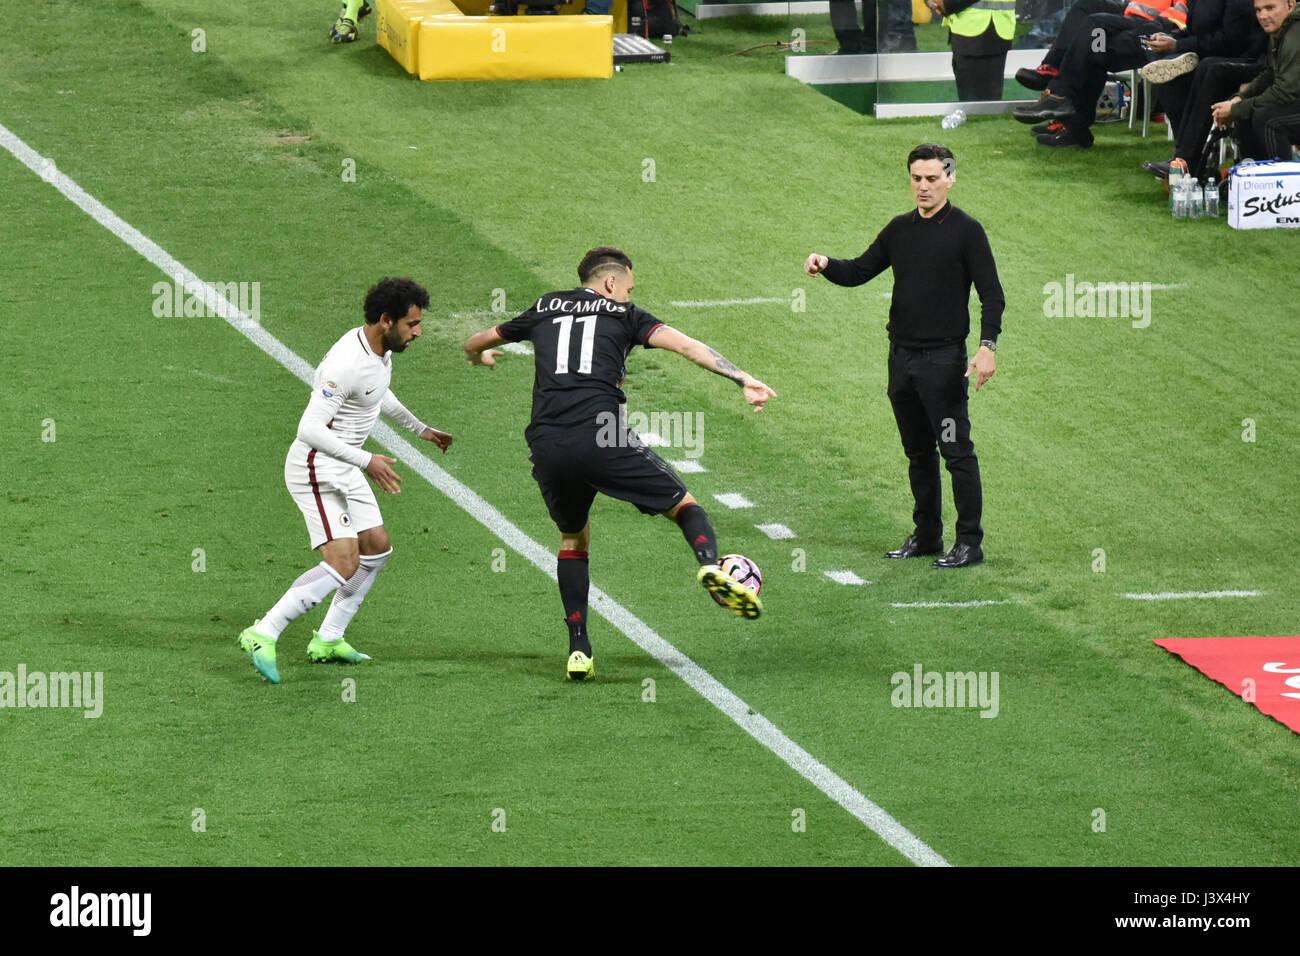 Milan, Italy. 7th May, 2017. italian serie A soccer match AC Milan vs AS Roma, at the san siro stadium, in Milan. Stock Photo